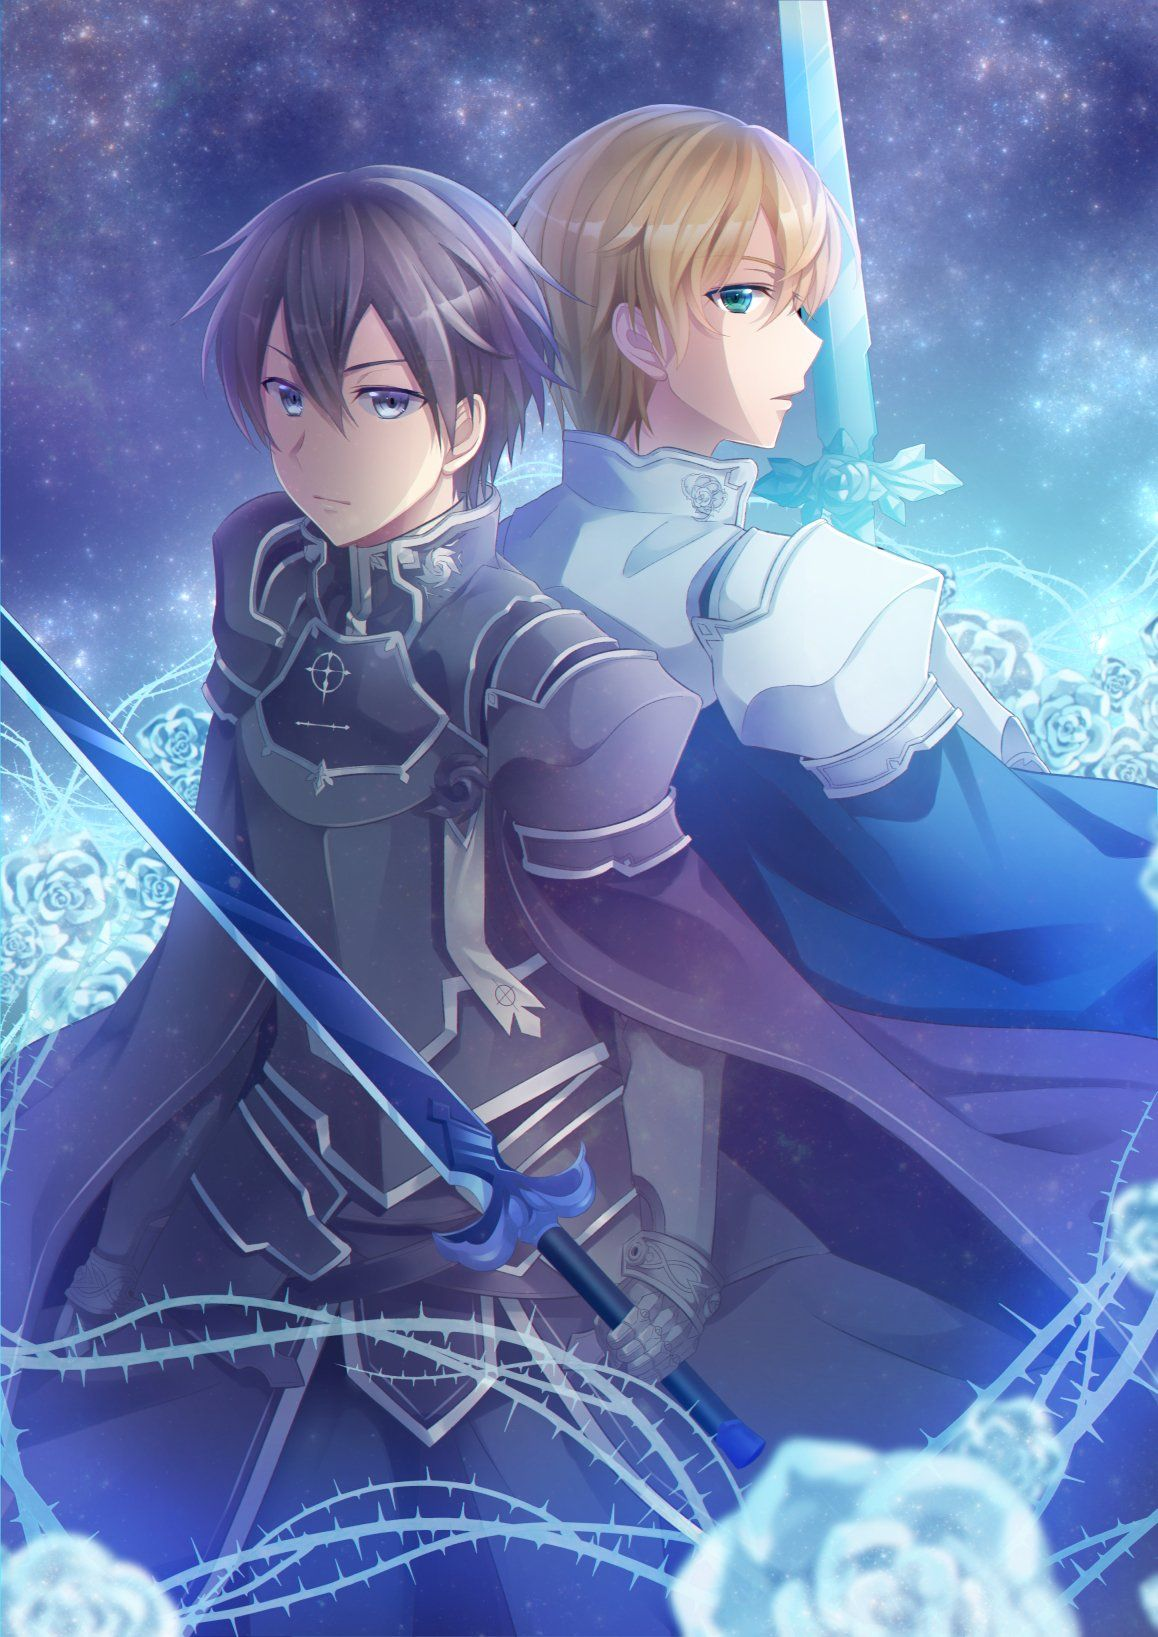 Kirito X Eugeo Integrity Knight Arte De Anime Personajes De Anime Fondo De Pantalla De Anime